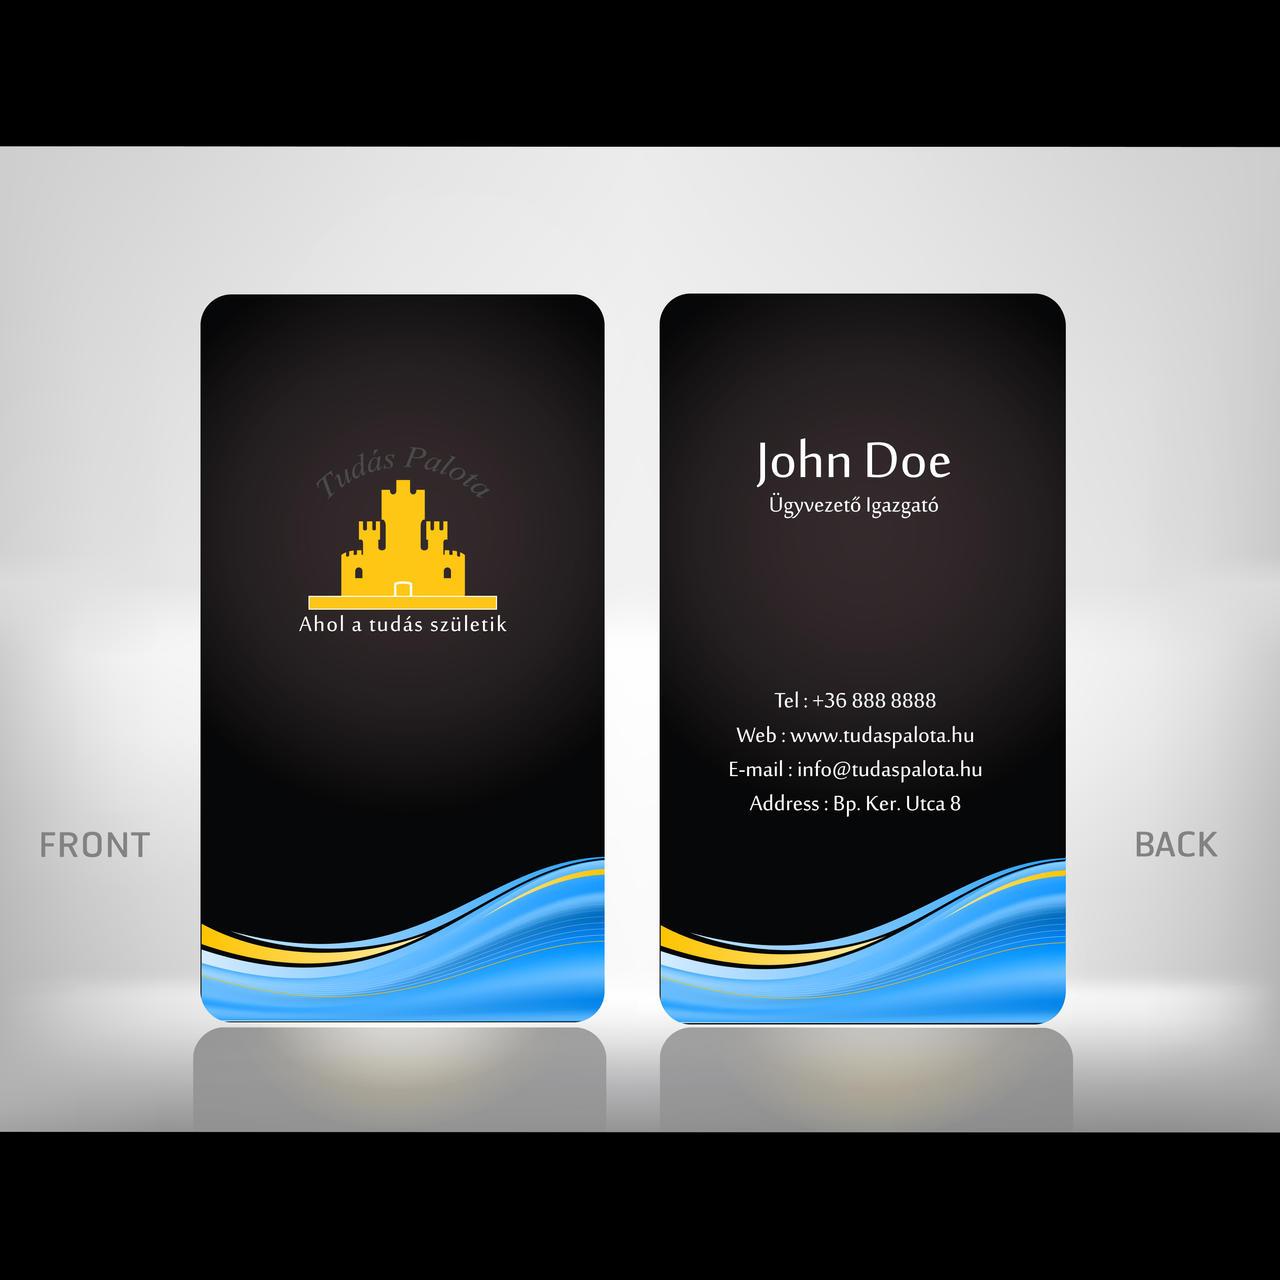 Doc845575 Sample Cards Business Card Sample Choose Samples to – Business Card Sample